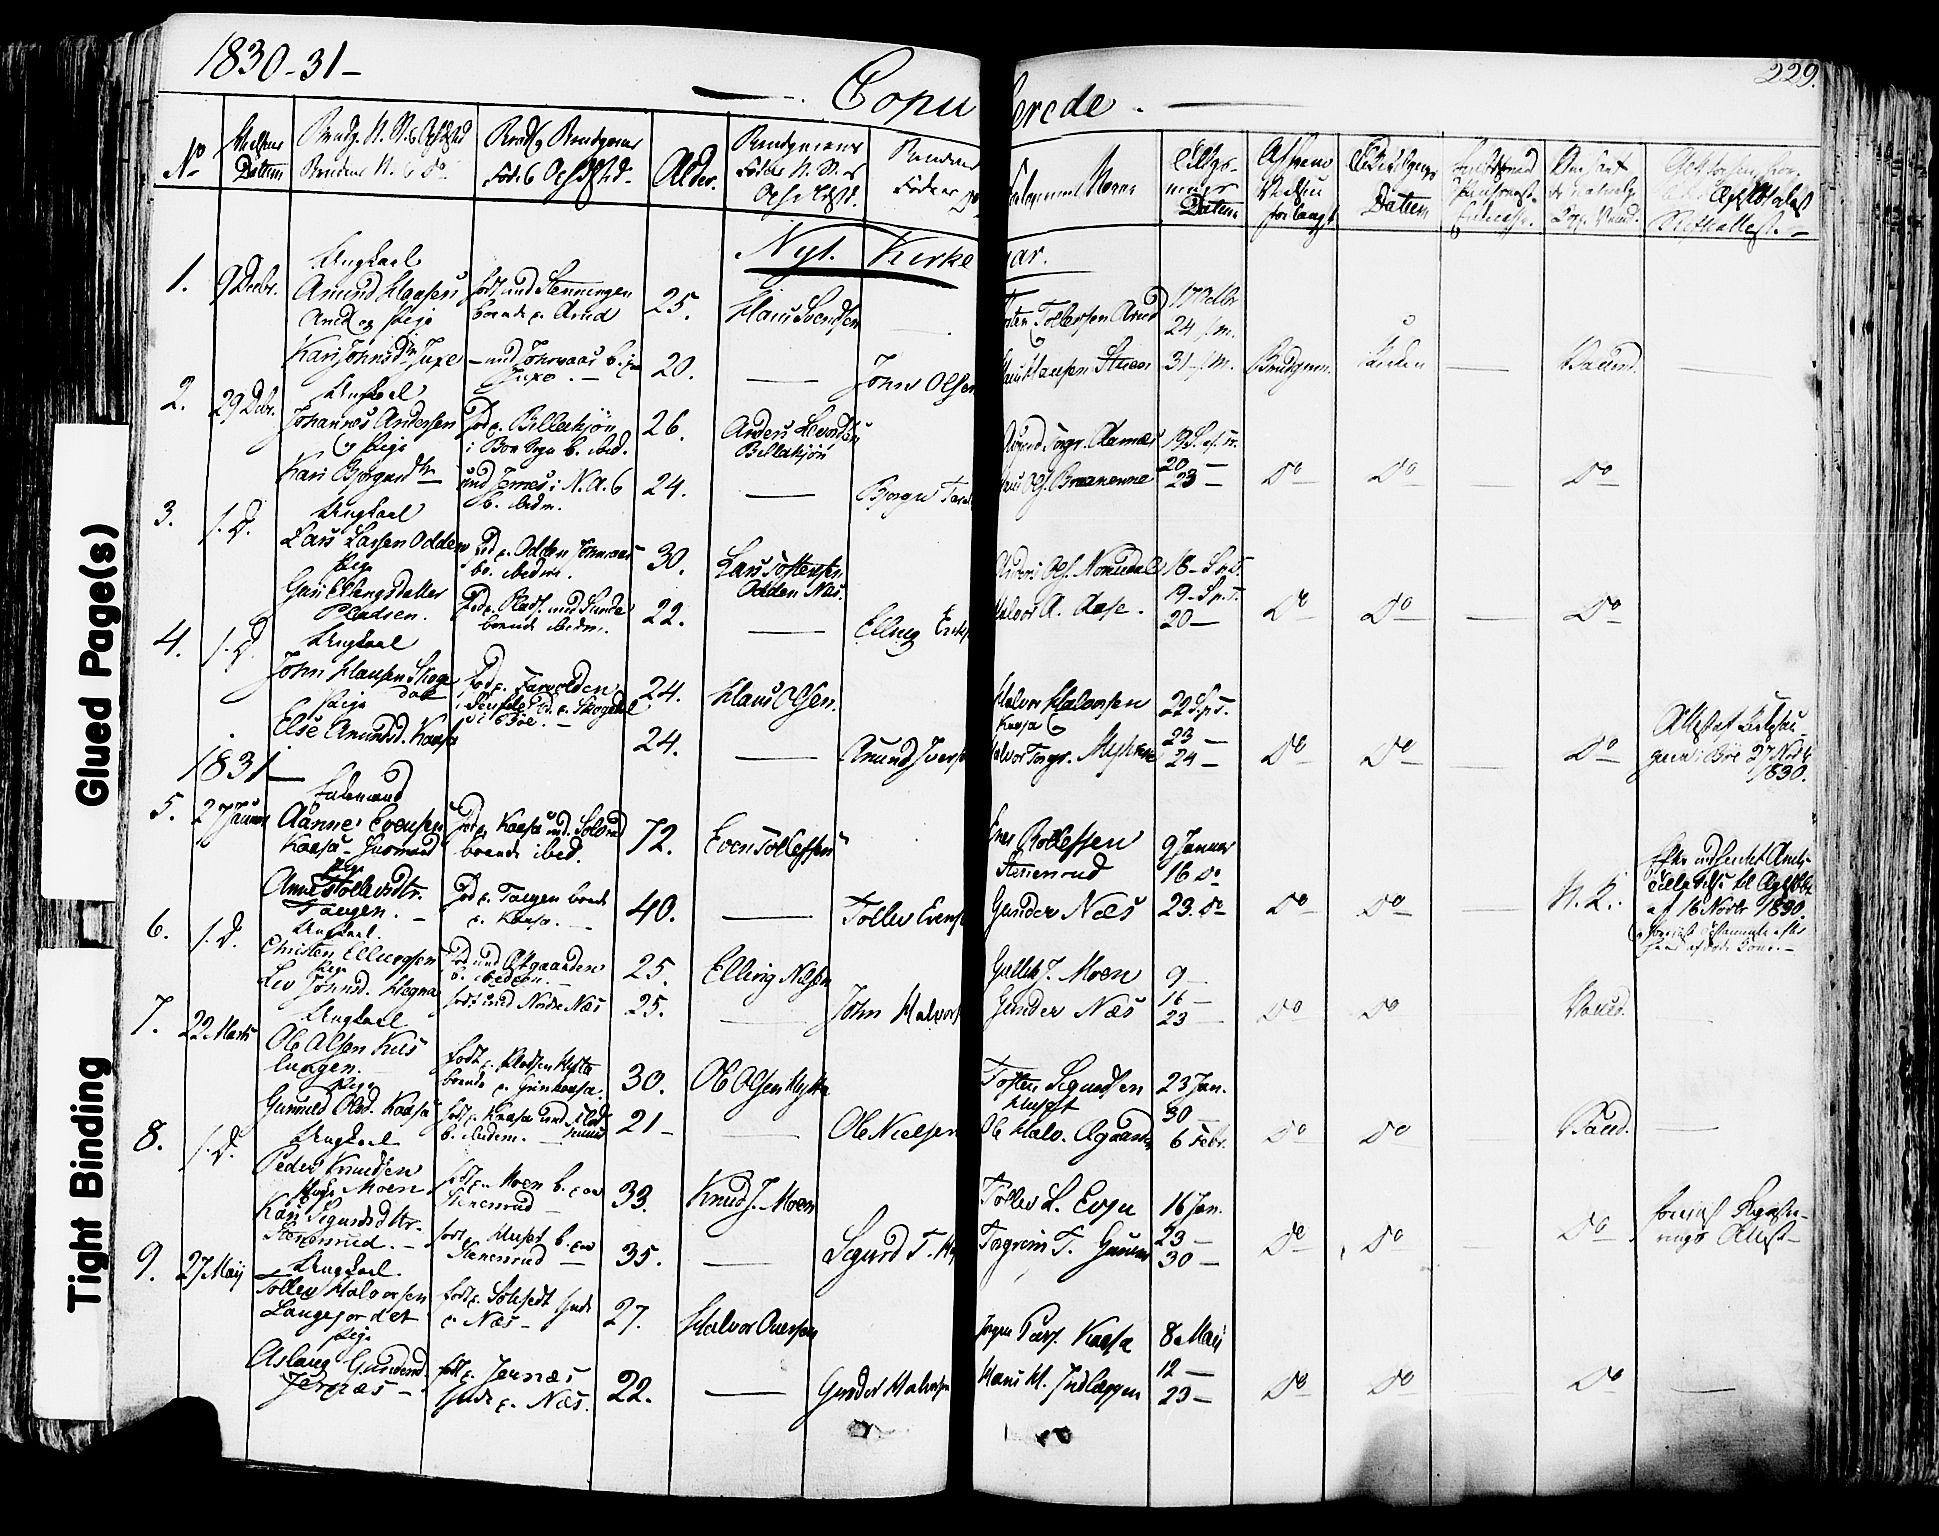 SAKO, Sauherad kirkebøker, F/Fa/L0006: Ministerialbok nr. I 6, 1827-1850, s. 229